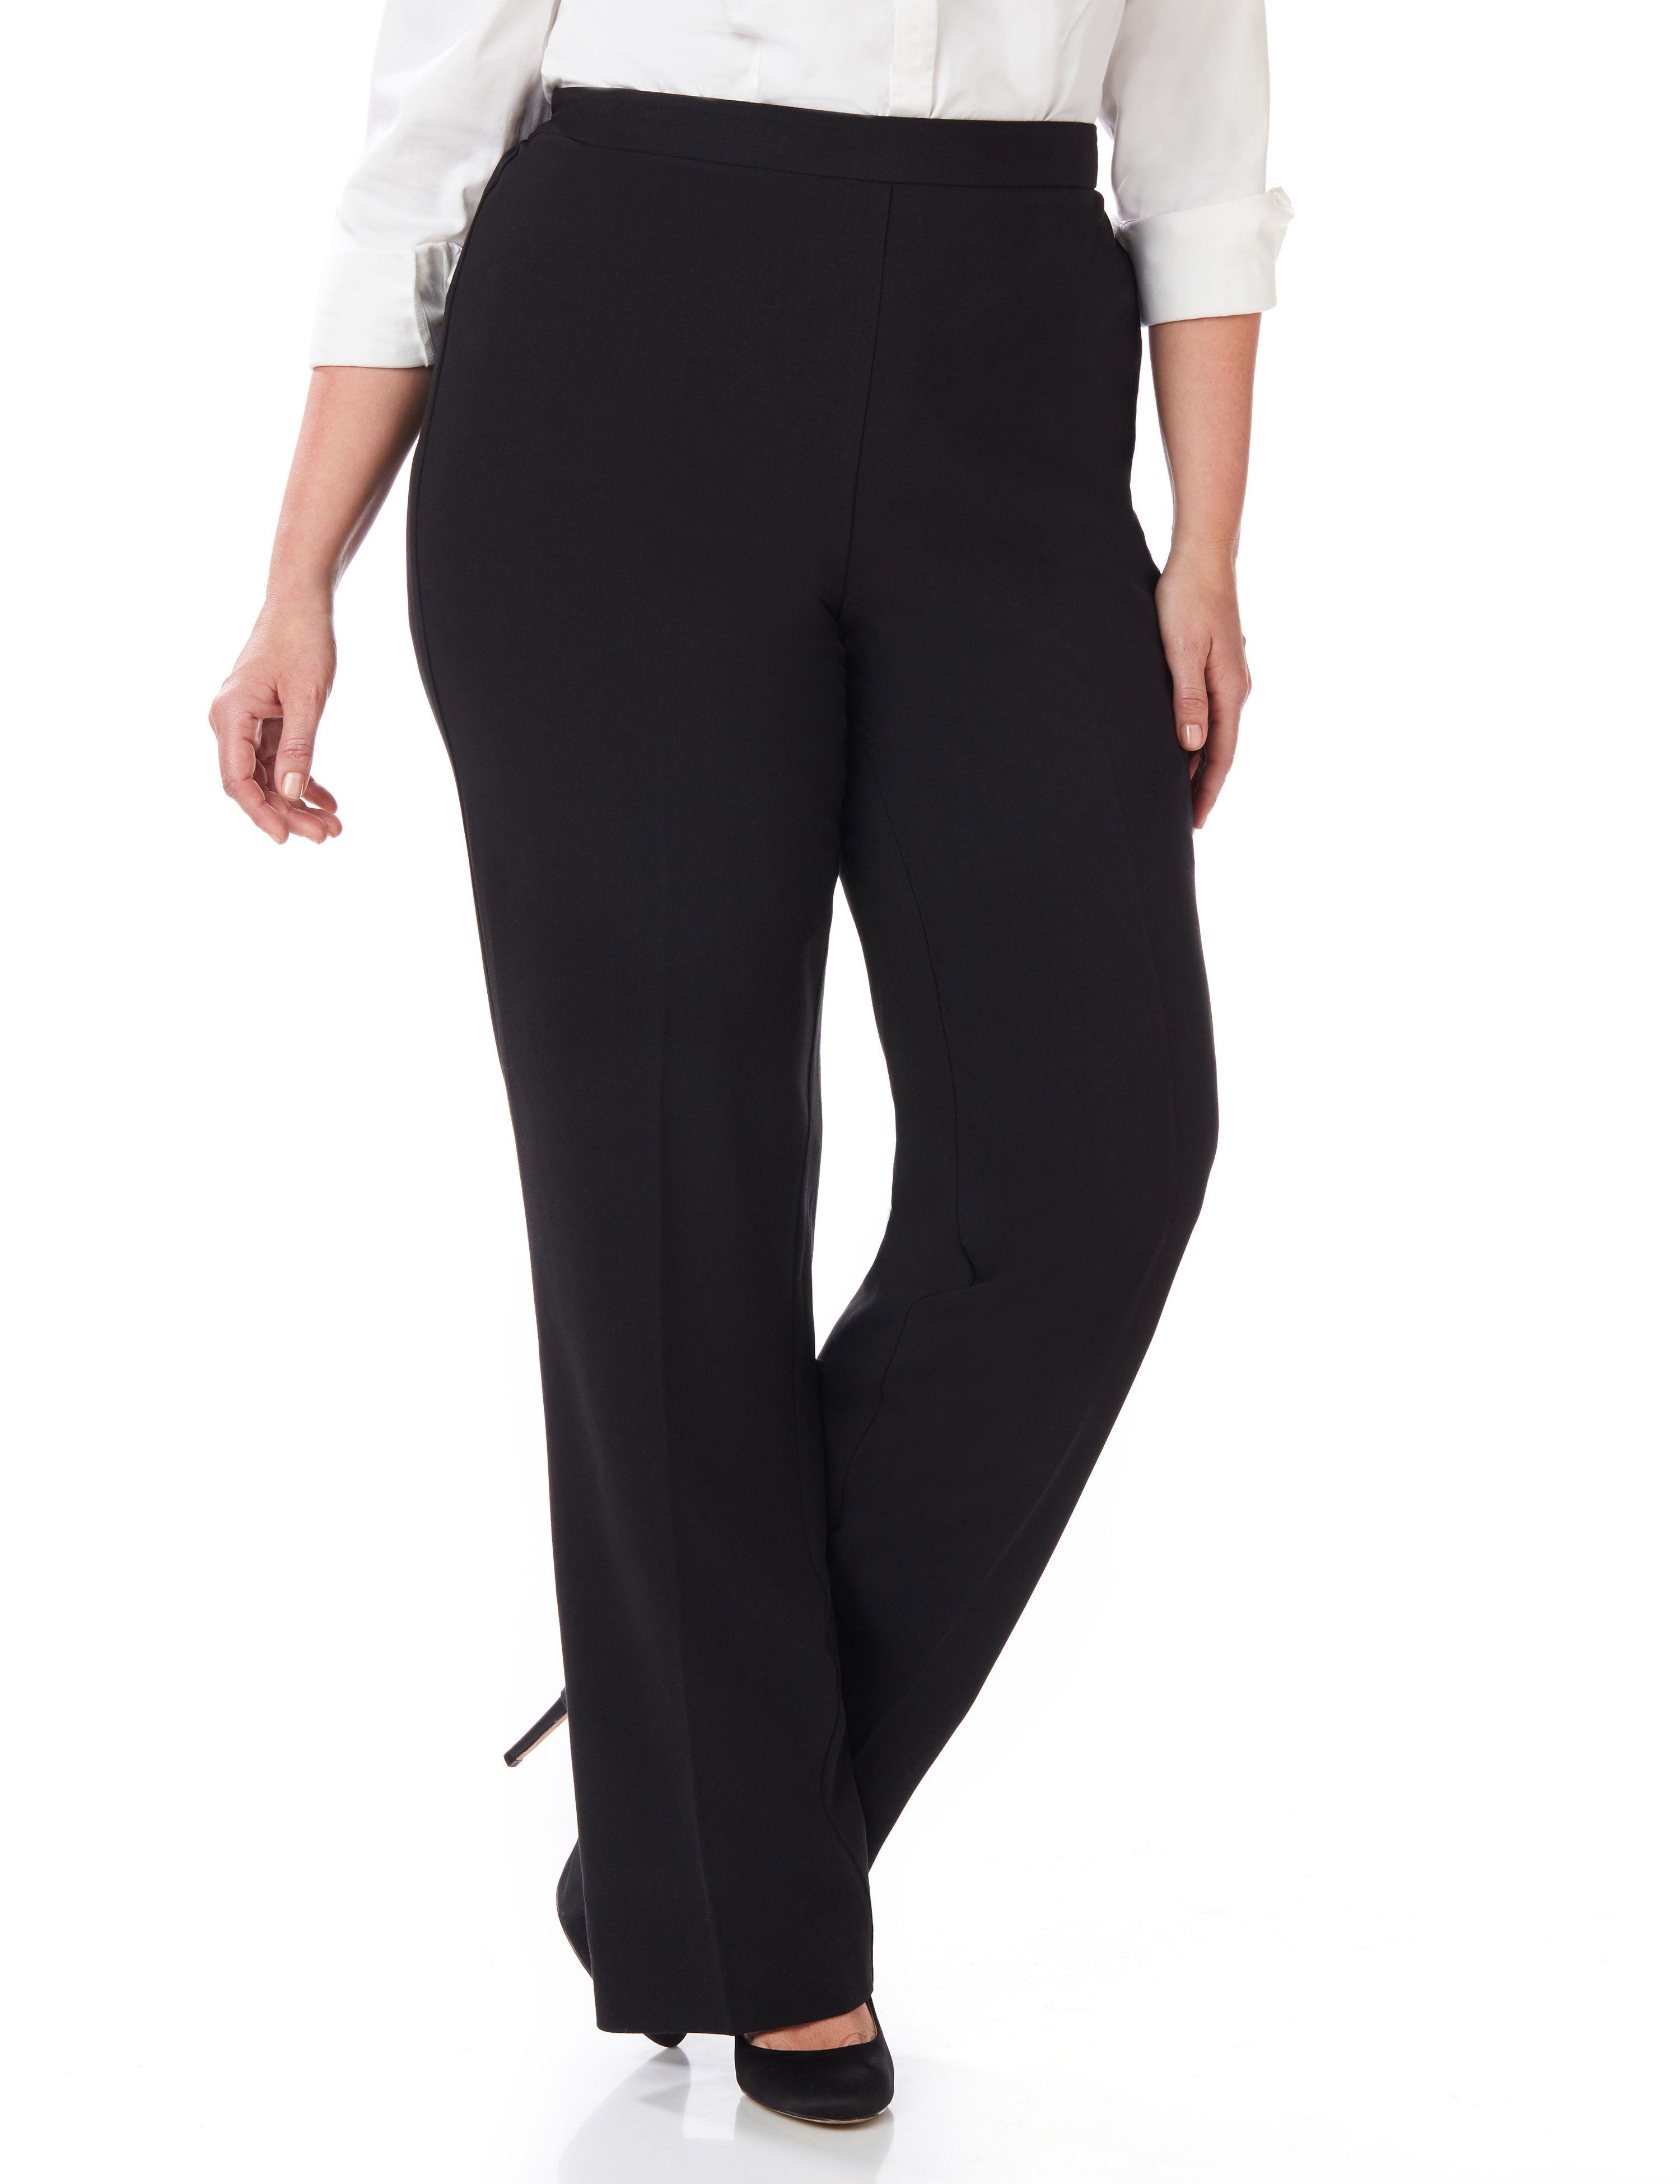 dress pants for plus size